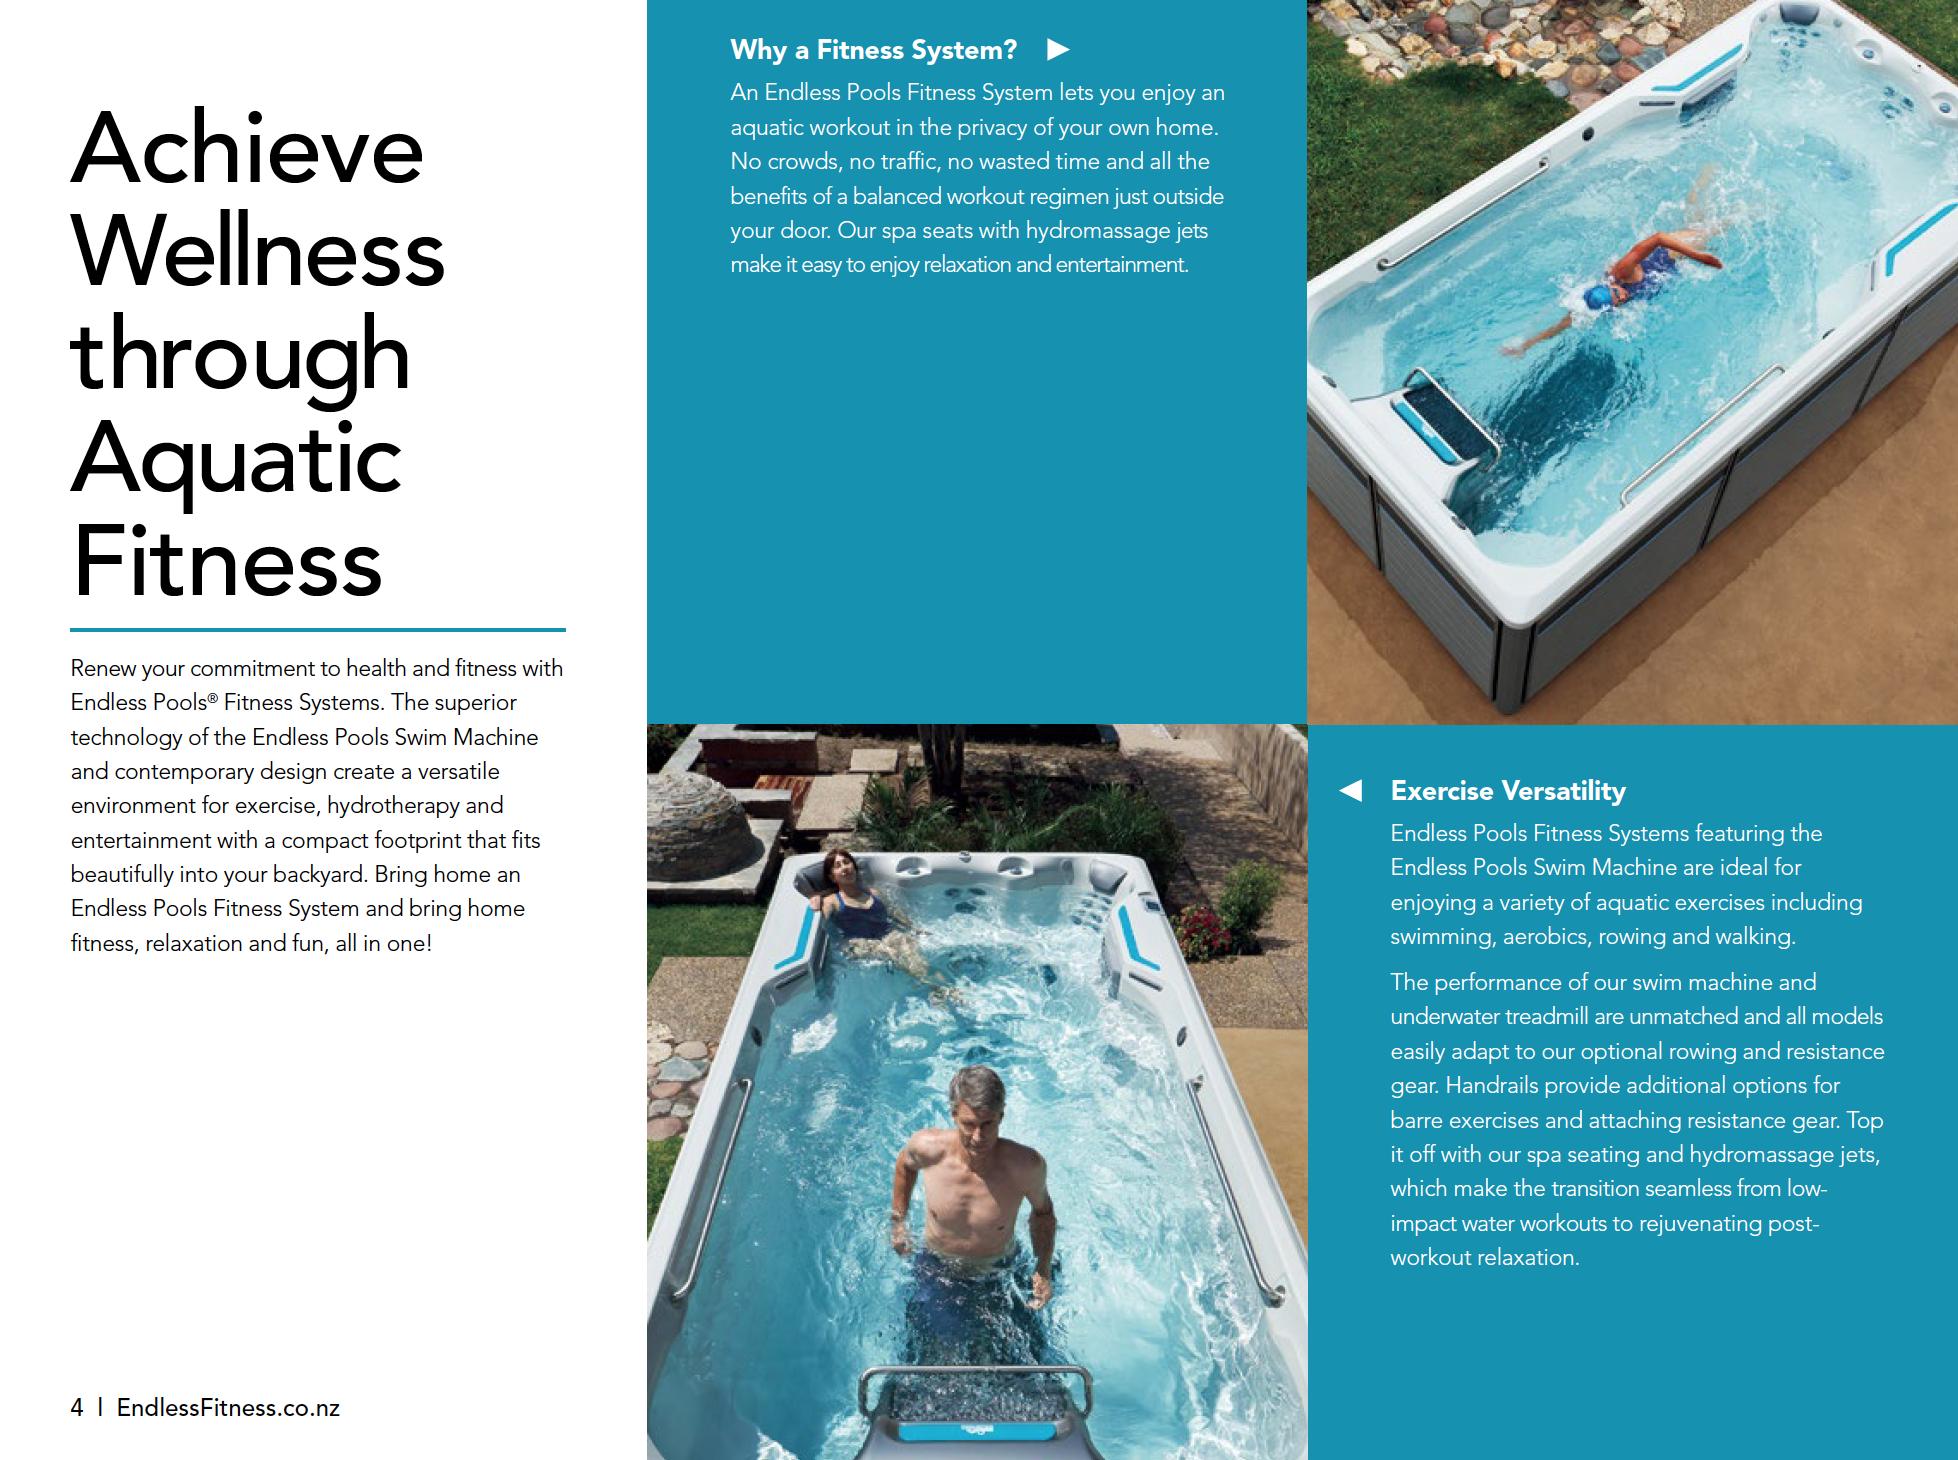 swim-spa-nz-endless-pools-2020-04-18-at-9.55.06-am-19.png